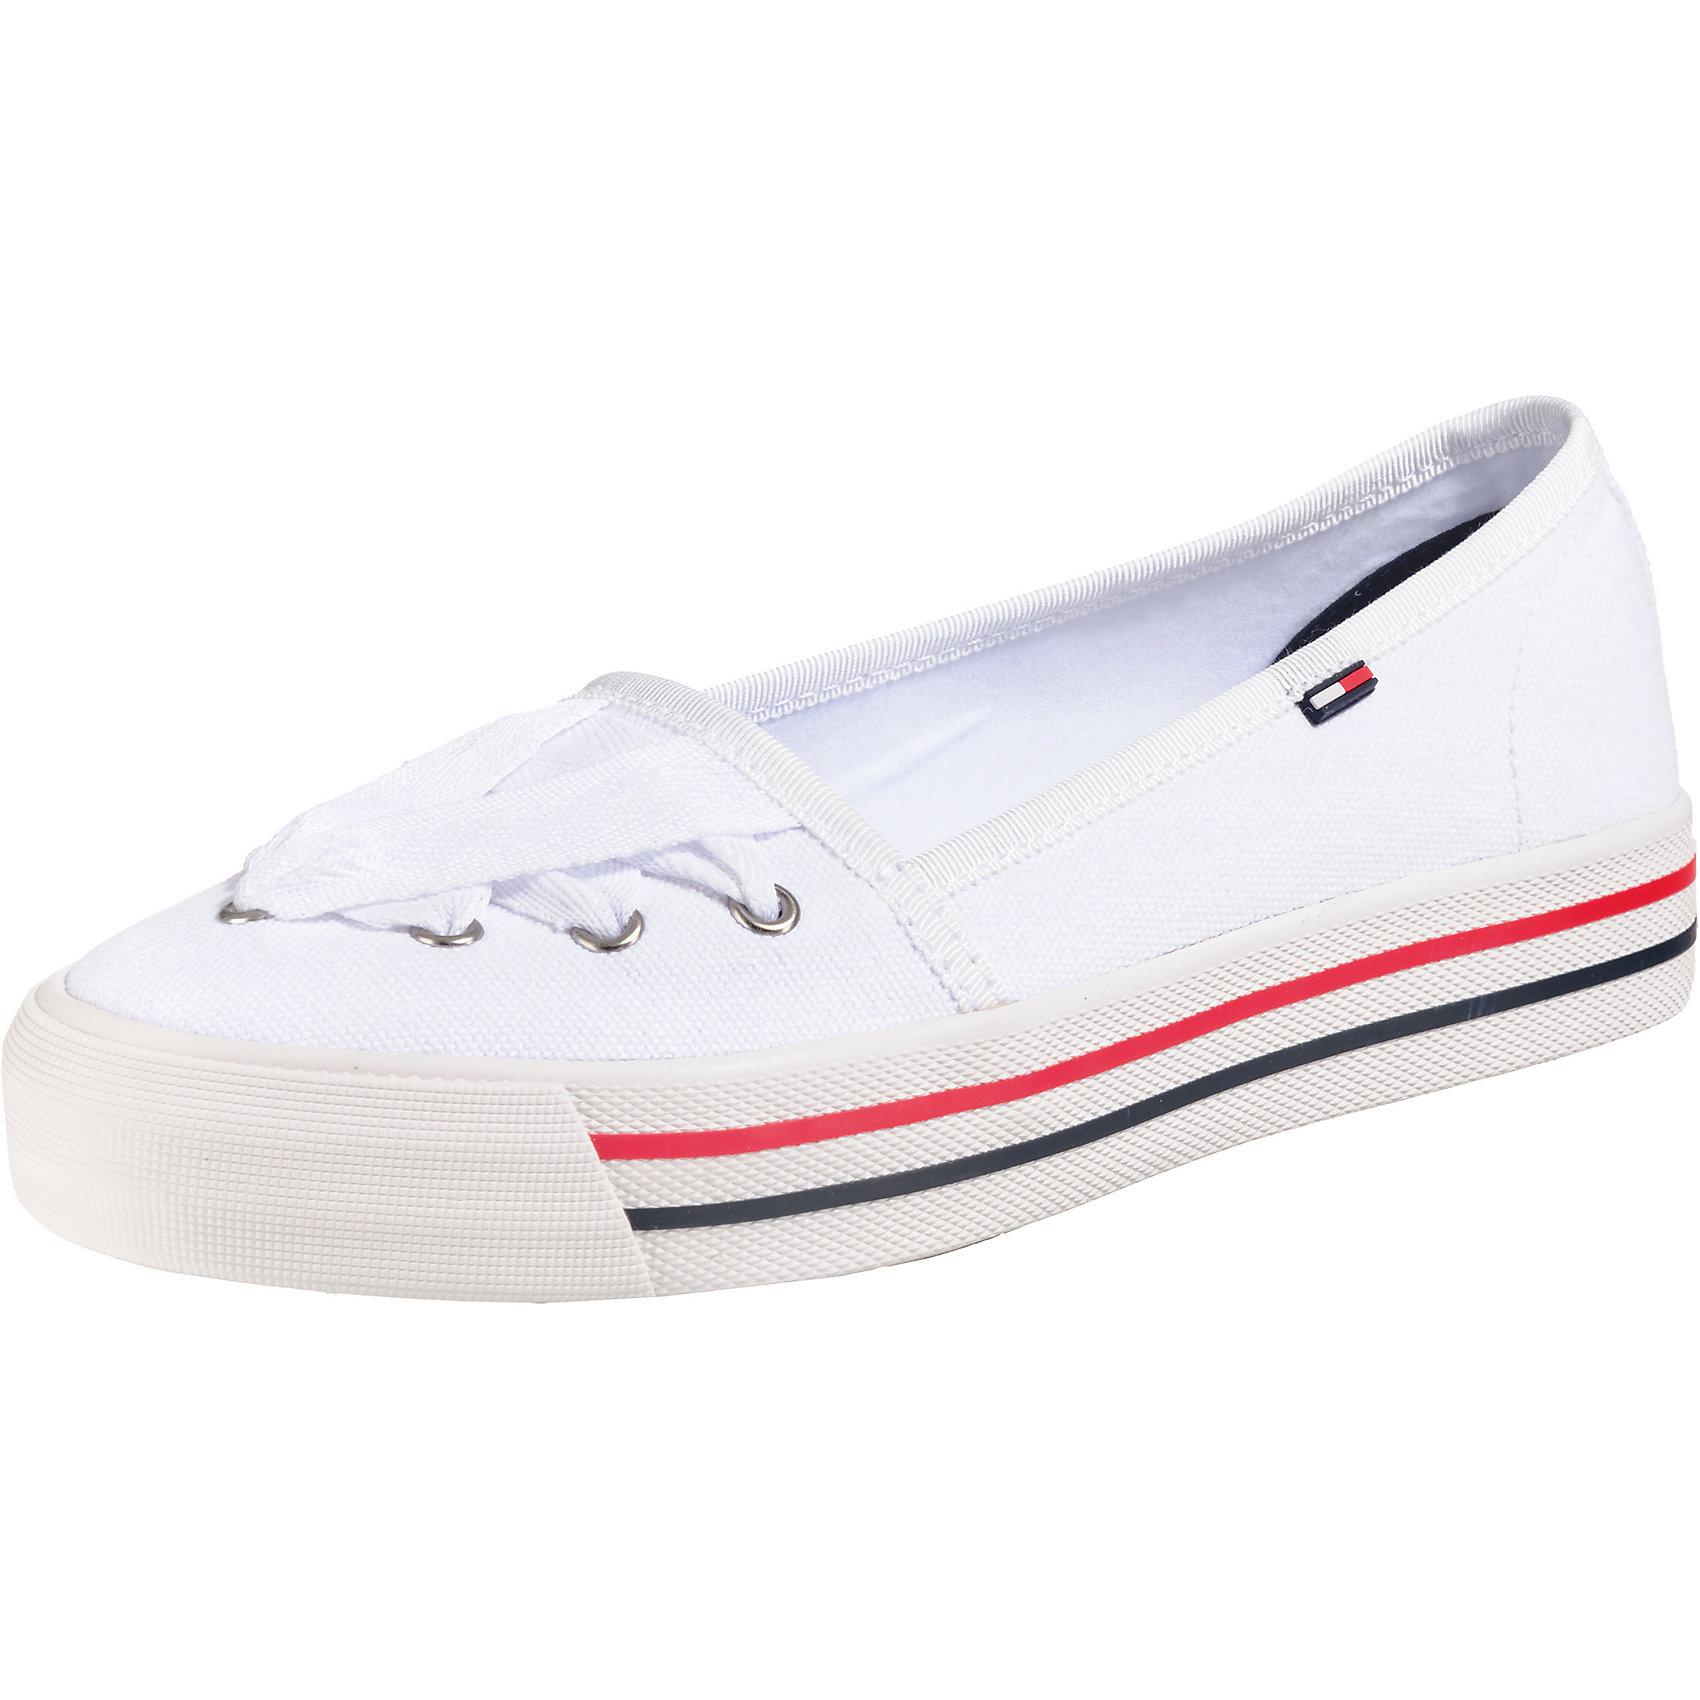 sneakers for cheap 4a0e4 f75b5 Details zu Neu TOMMY JEANS Lace Sneaker Sportliche Ballerinas 7151687 für  Damen